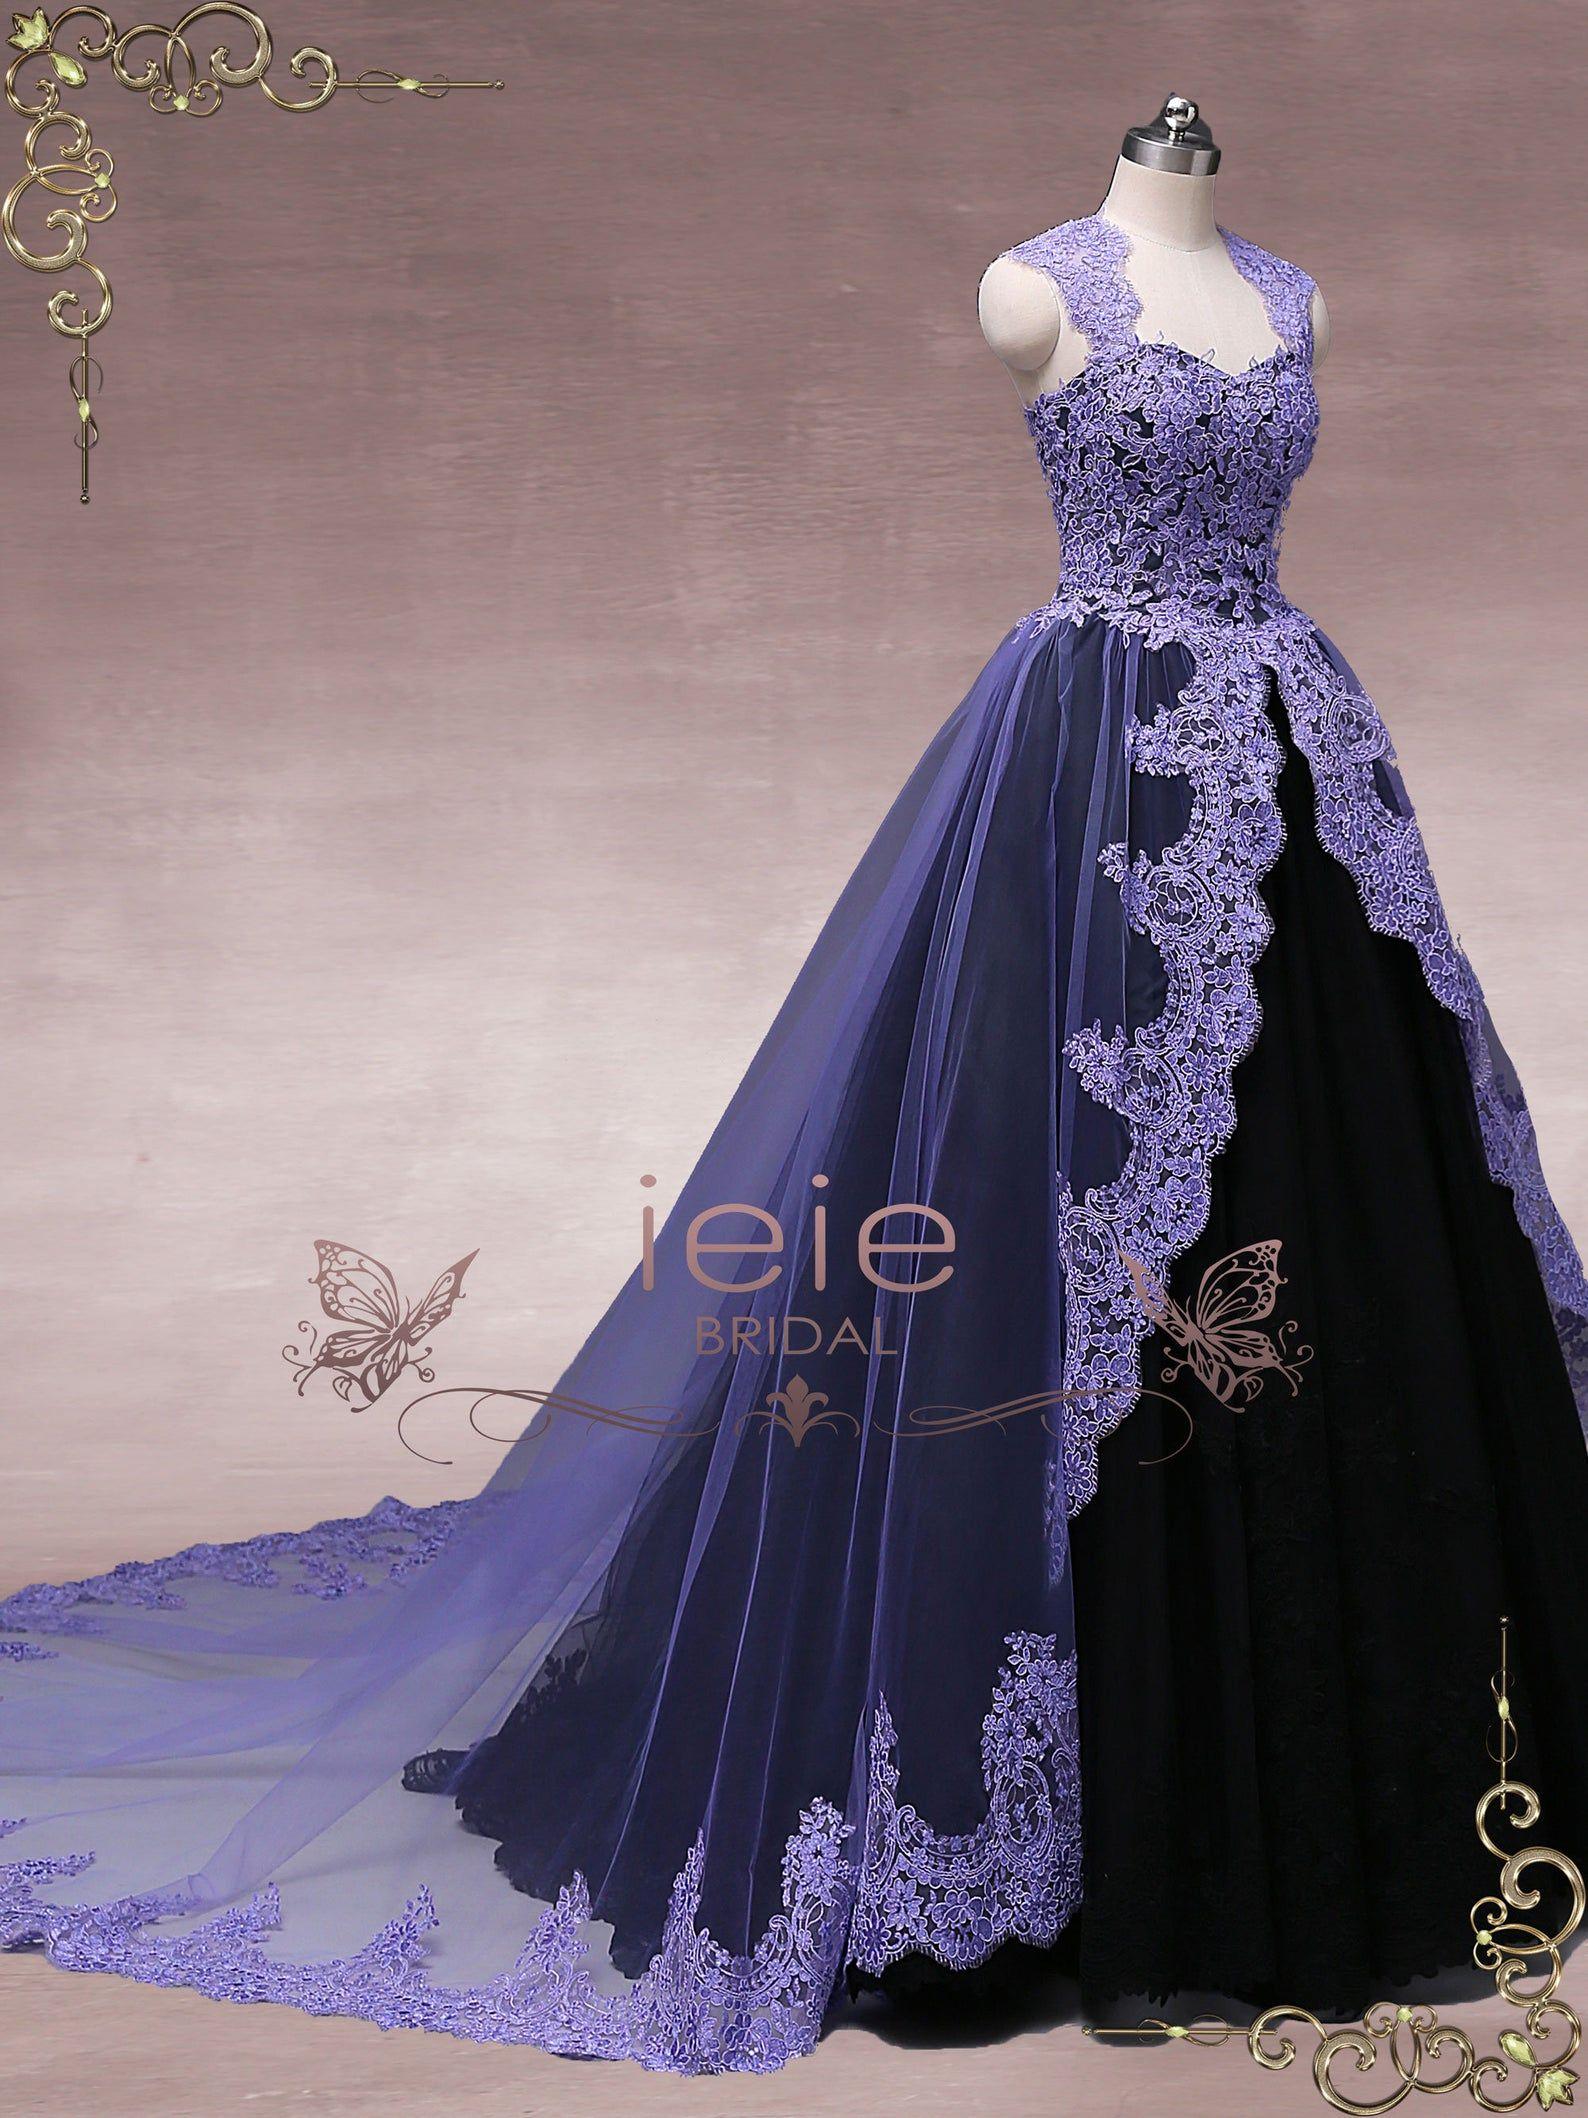 Unique Purple Black Ball Gown Wedding Dress Halloween Wedding Etsy Black Ball Gown Ball Gowns Ball Gowns Wedding [ 2118 x 1588 Pixel ]